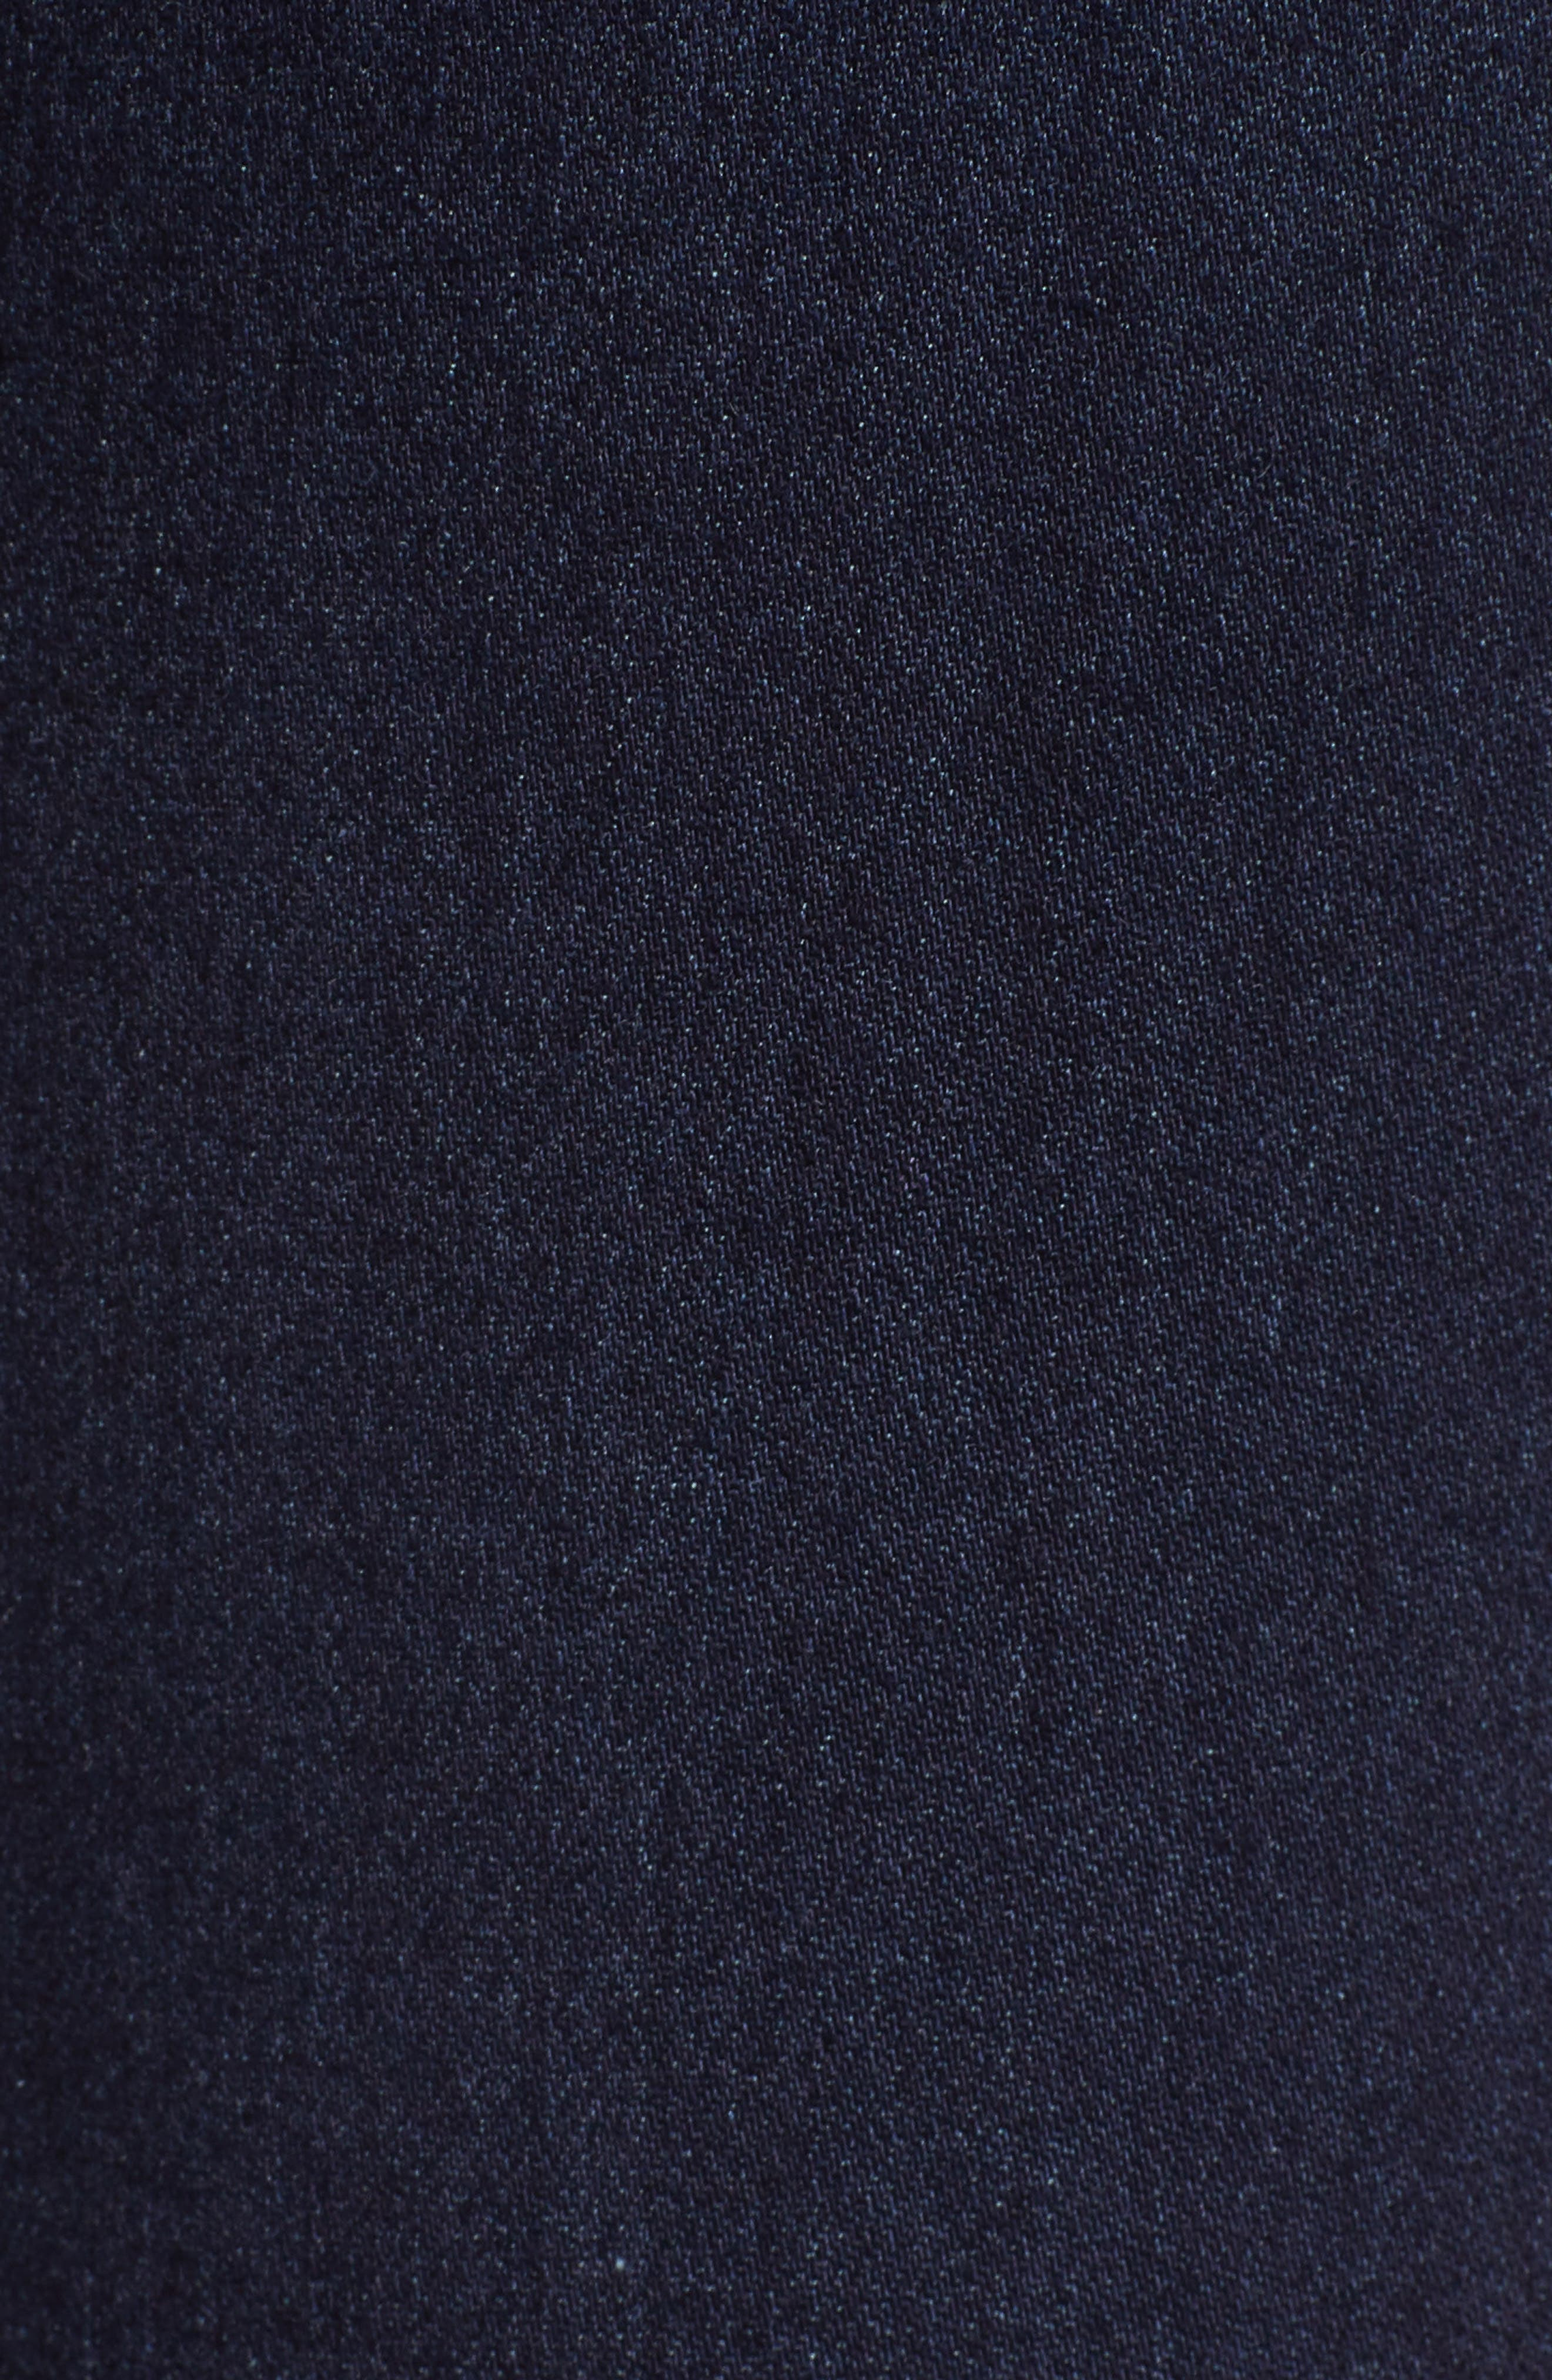 Transcend - Hoxton High Waist Ultra Skinny Jeans,                             Alternate thumbnail 6, color,                             SANIA